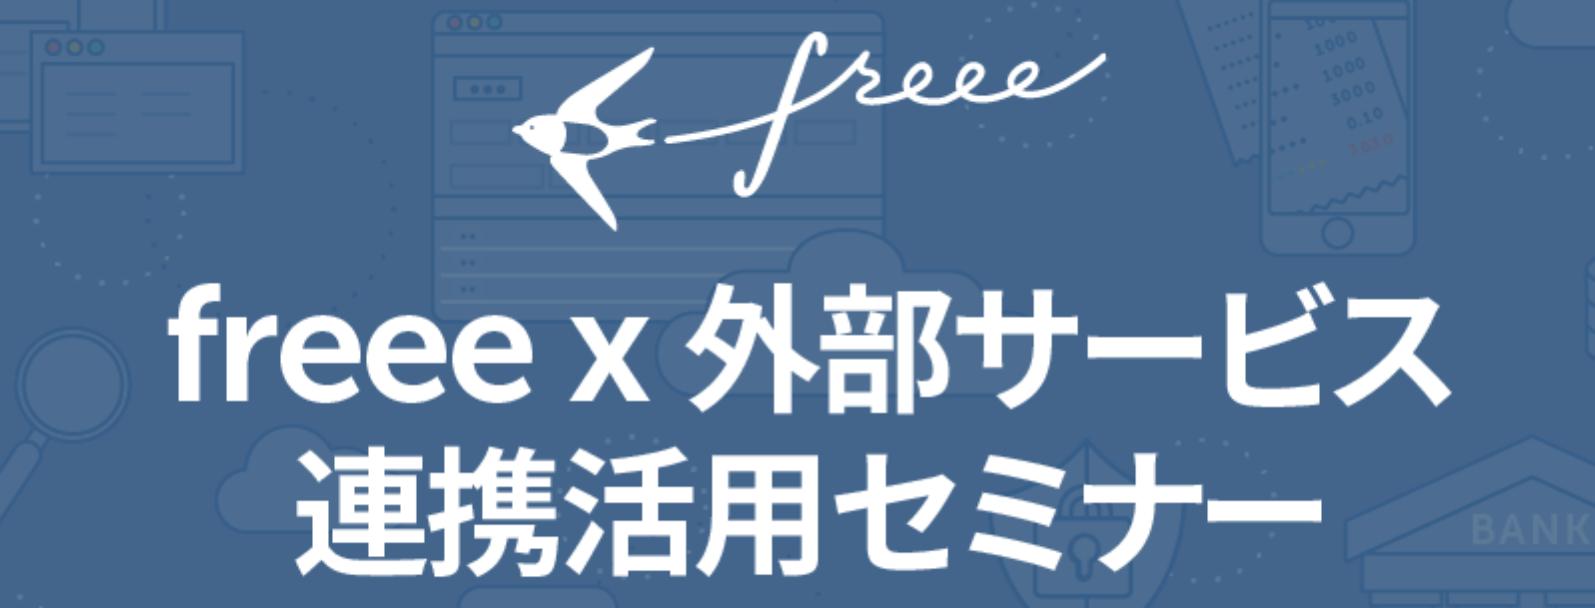 freee×外部サービス連携活用セミナー